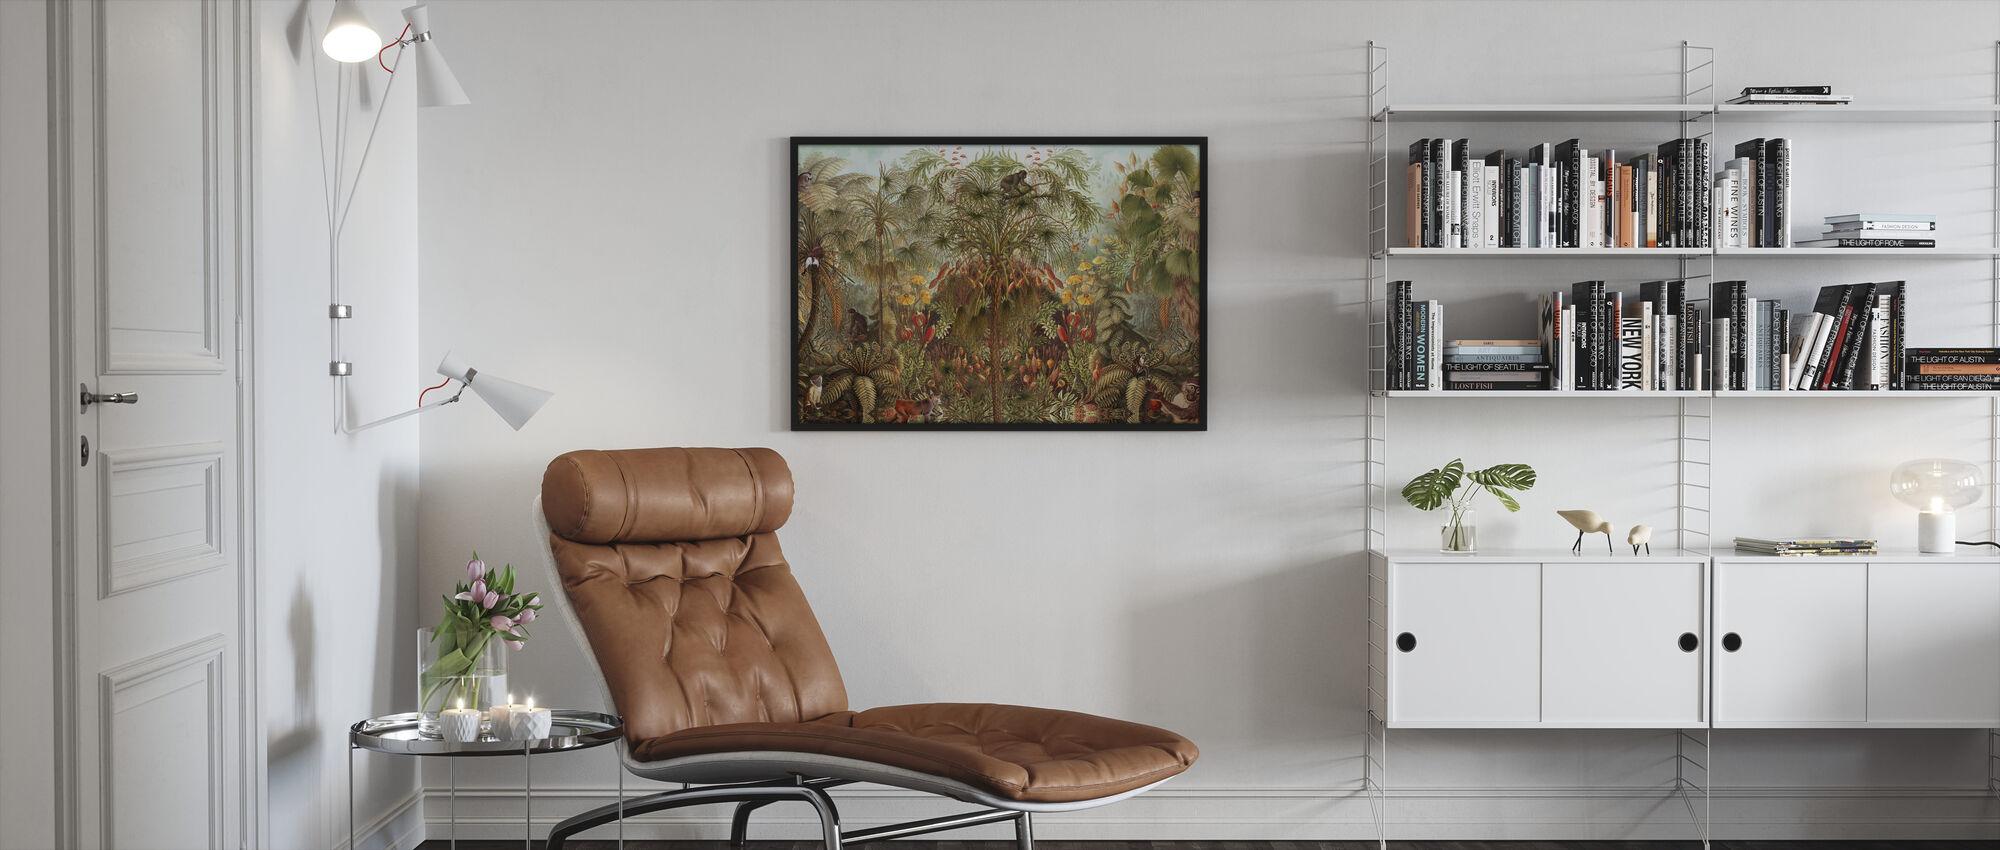 Monkey See Monkey Wah - Framed print - Living Room